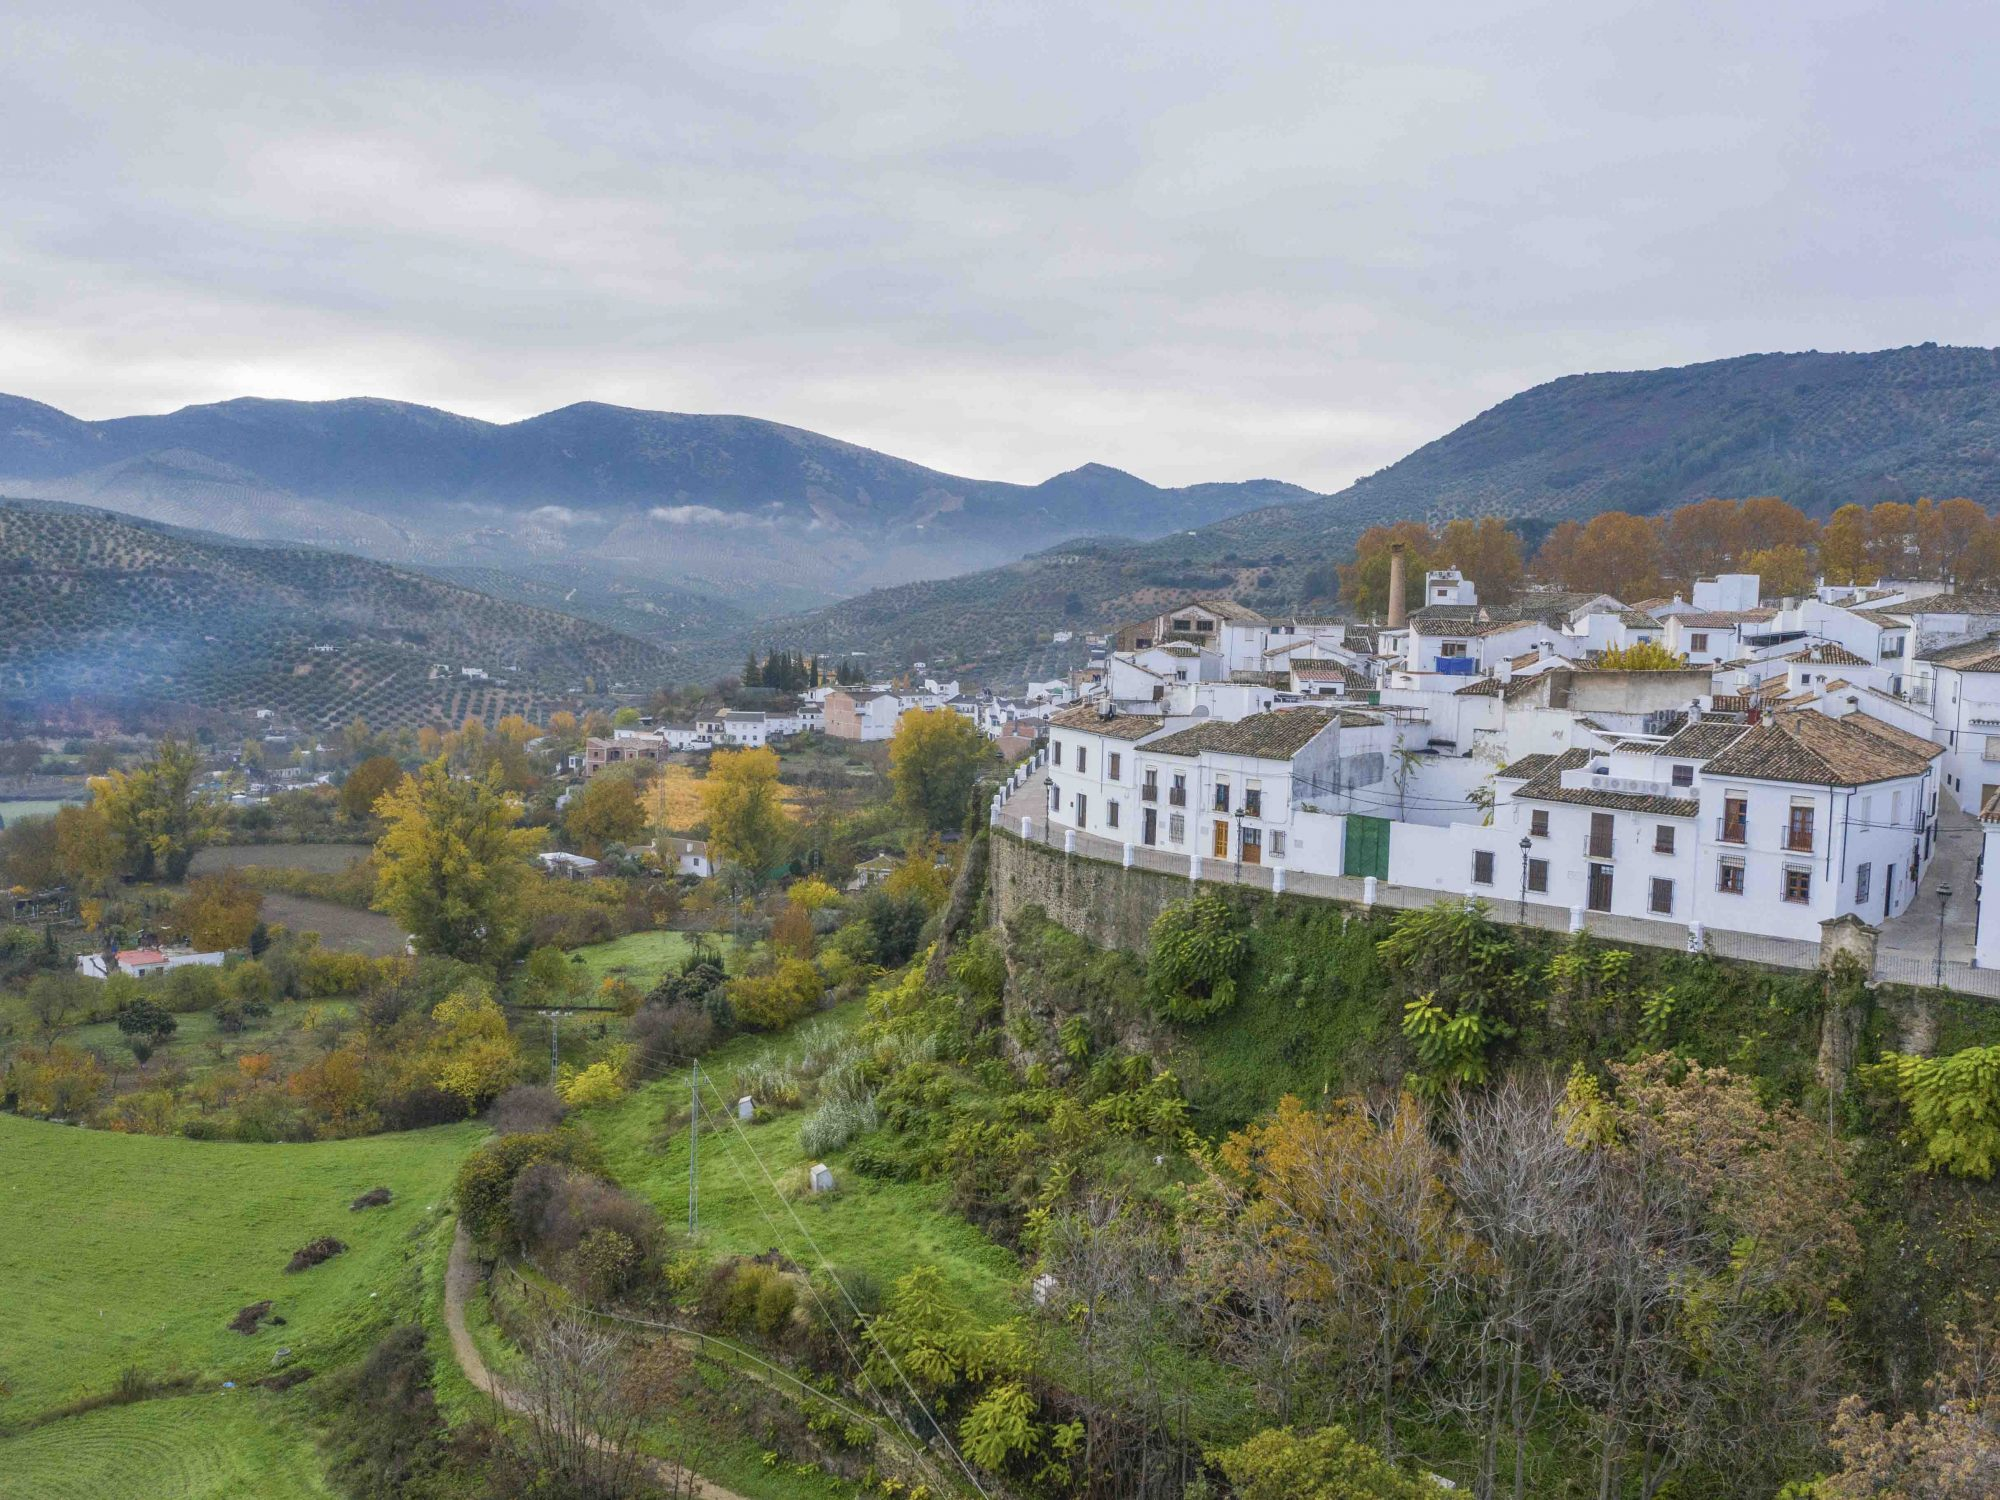 Spanien Andalusien, Provinz Cordoba, Priego de Cordoba  umgeben von Olivenhainen.